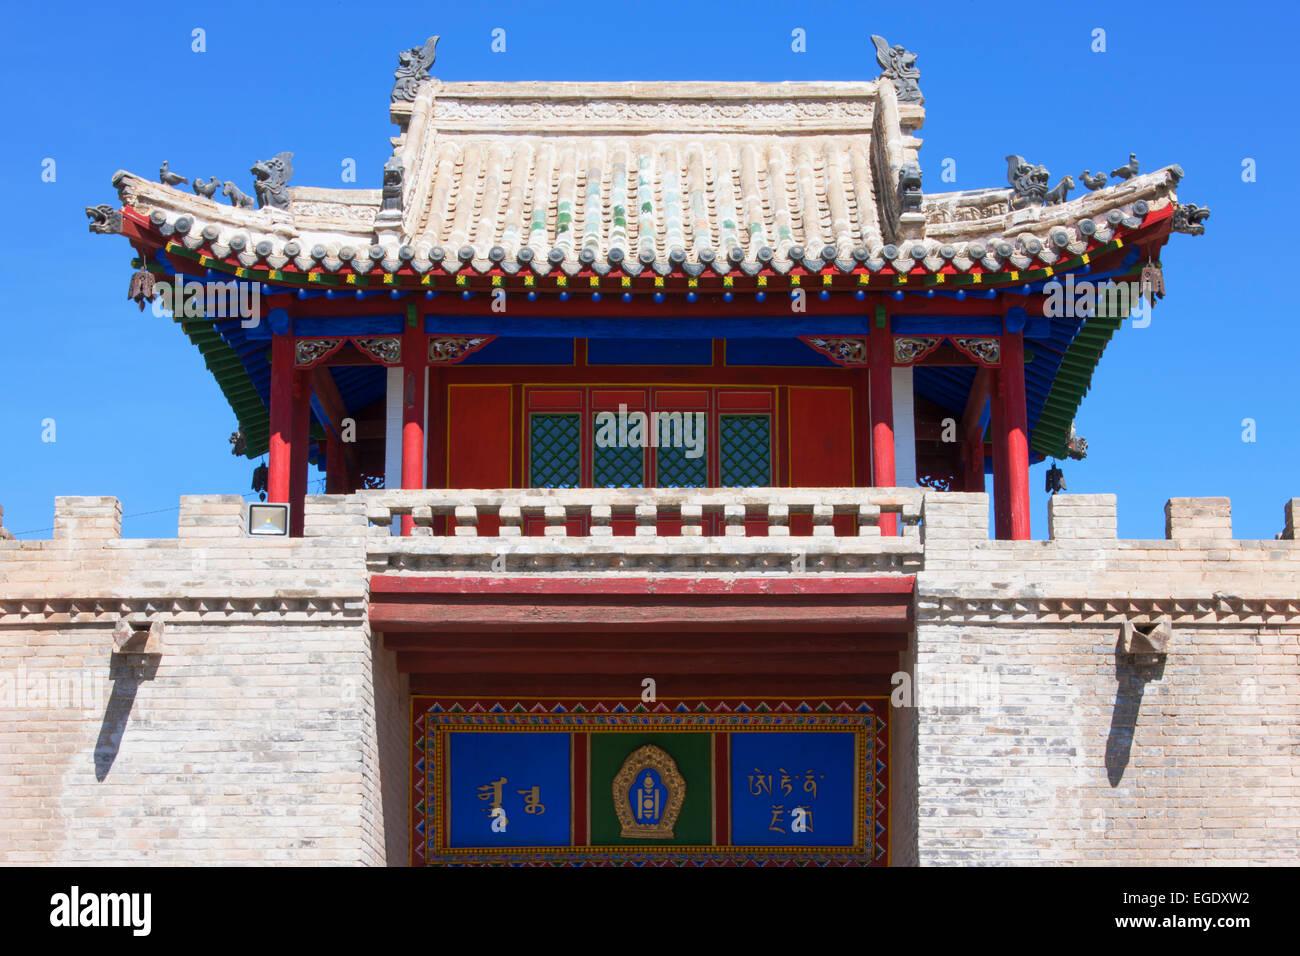 Entrance gate of Erdene Zuu Khiid, Kharkhorin, Ovorkhangai, Mongolia - Stock Image